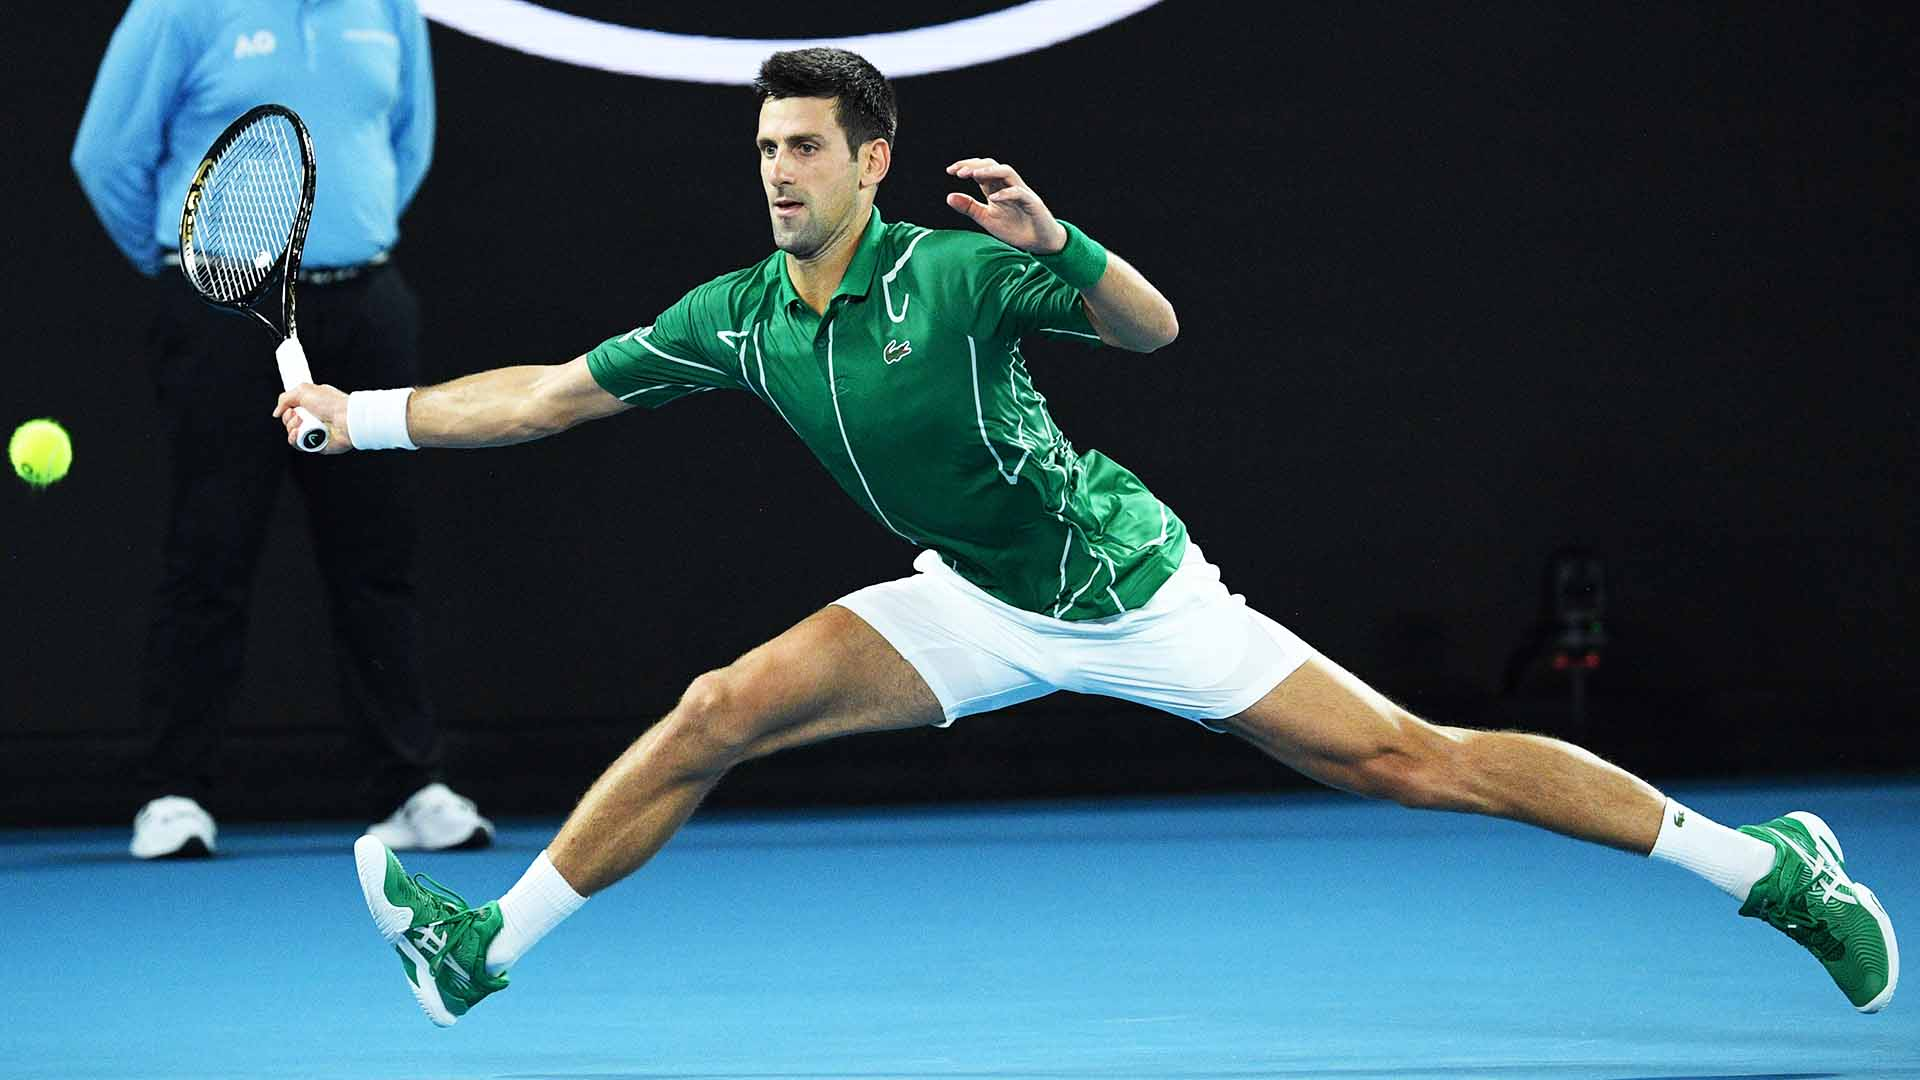 <a href='https://www.atptour.com/en/players/novak-djokovic/d643/overview'>Novak Djokovic</a> is unbeaten in 2020.